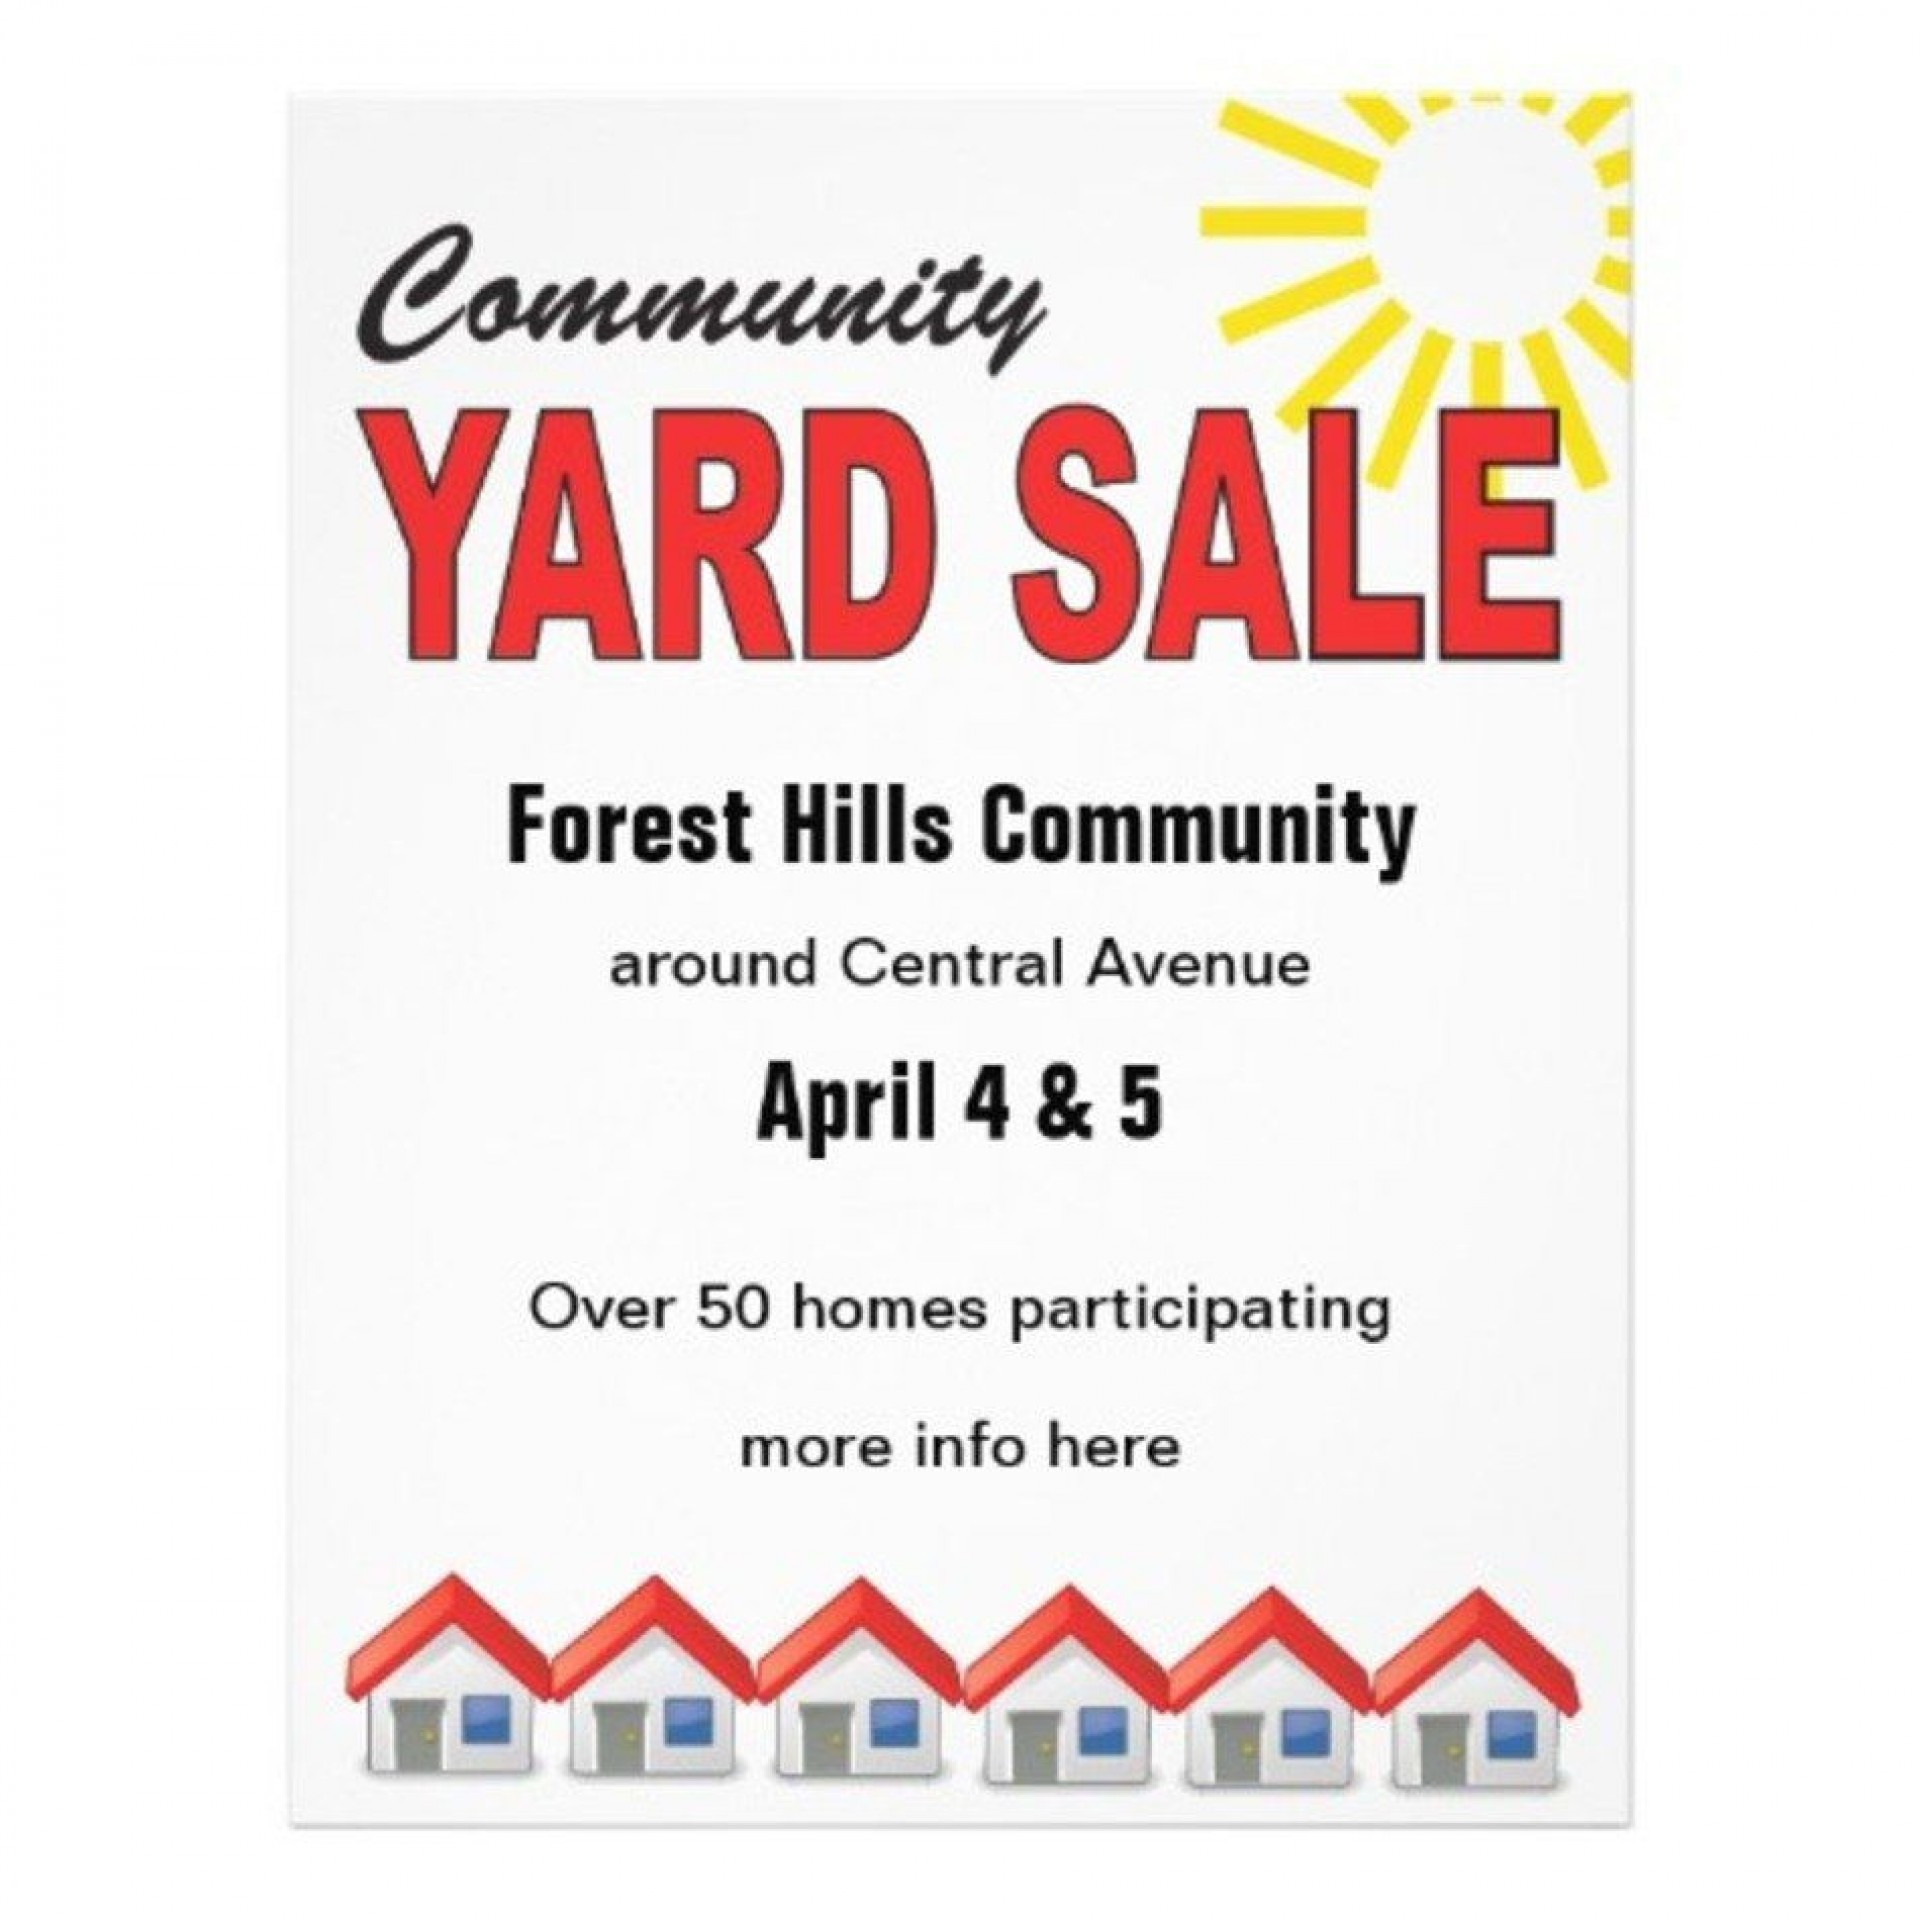 004 Magnificent Garage Sale Flyer Template Free Concept  Community Neighborhood Yard1920